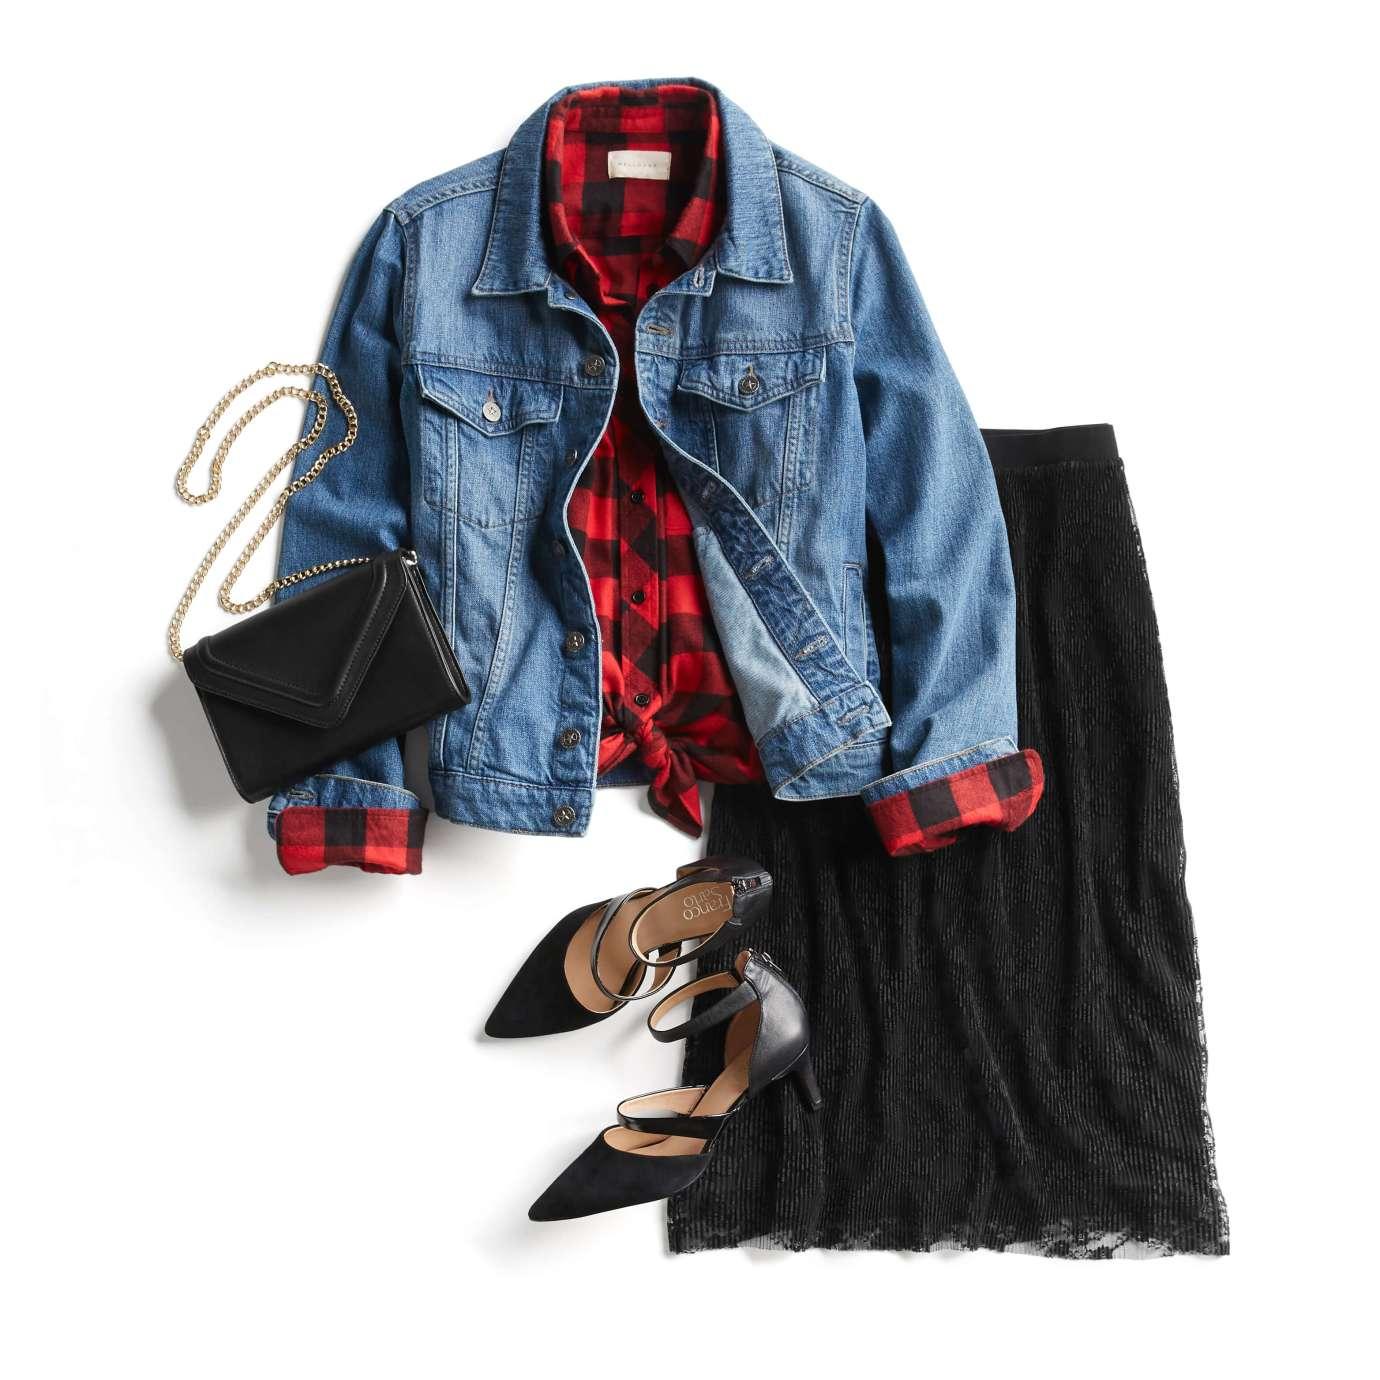 wear oversized denim jacket with skirt